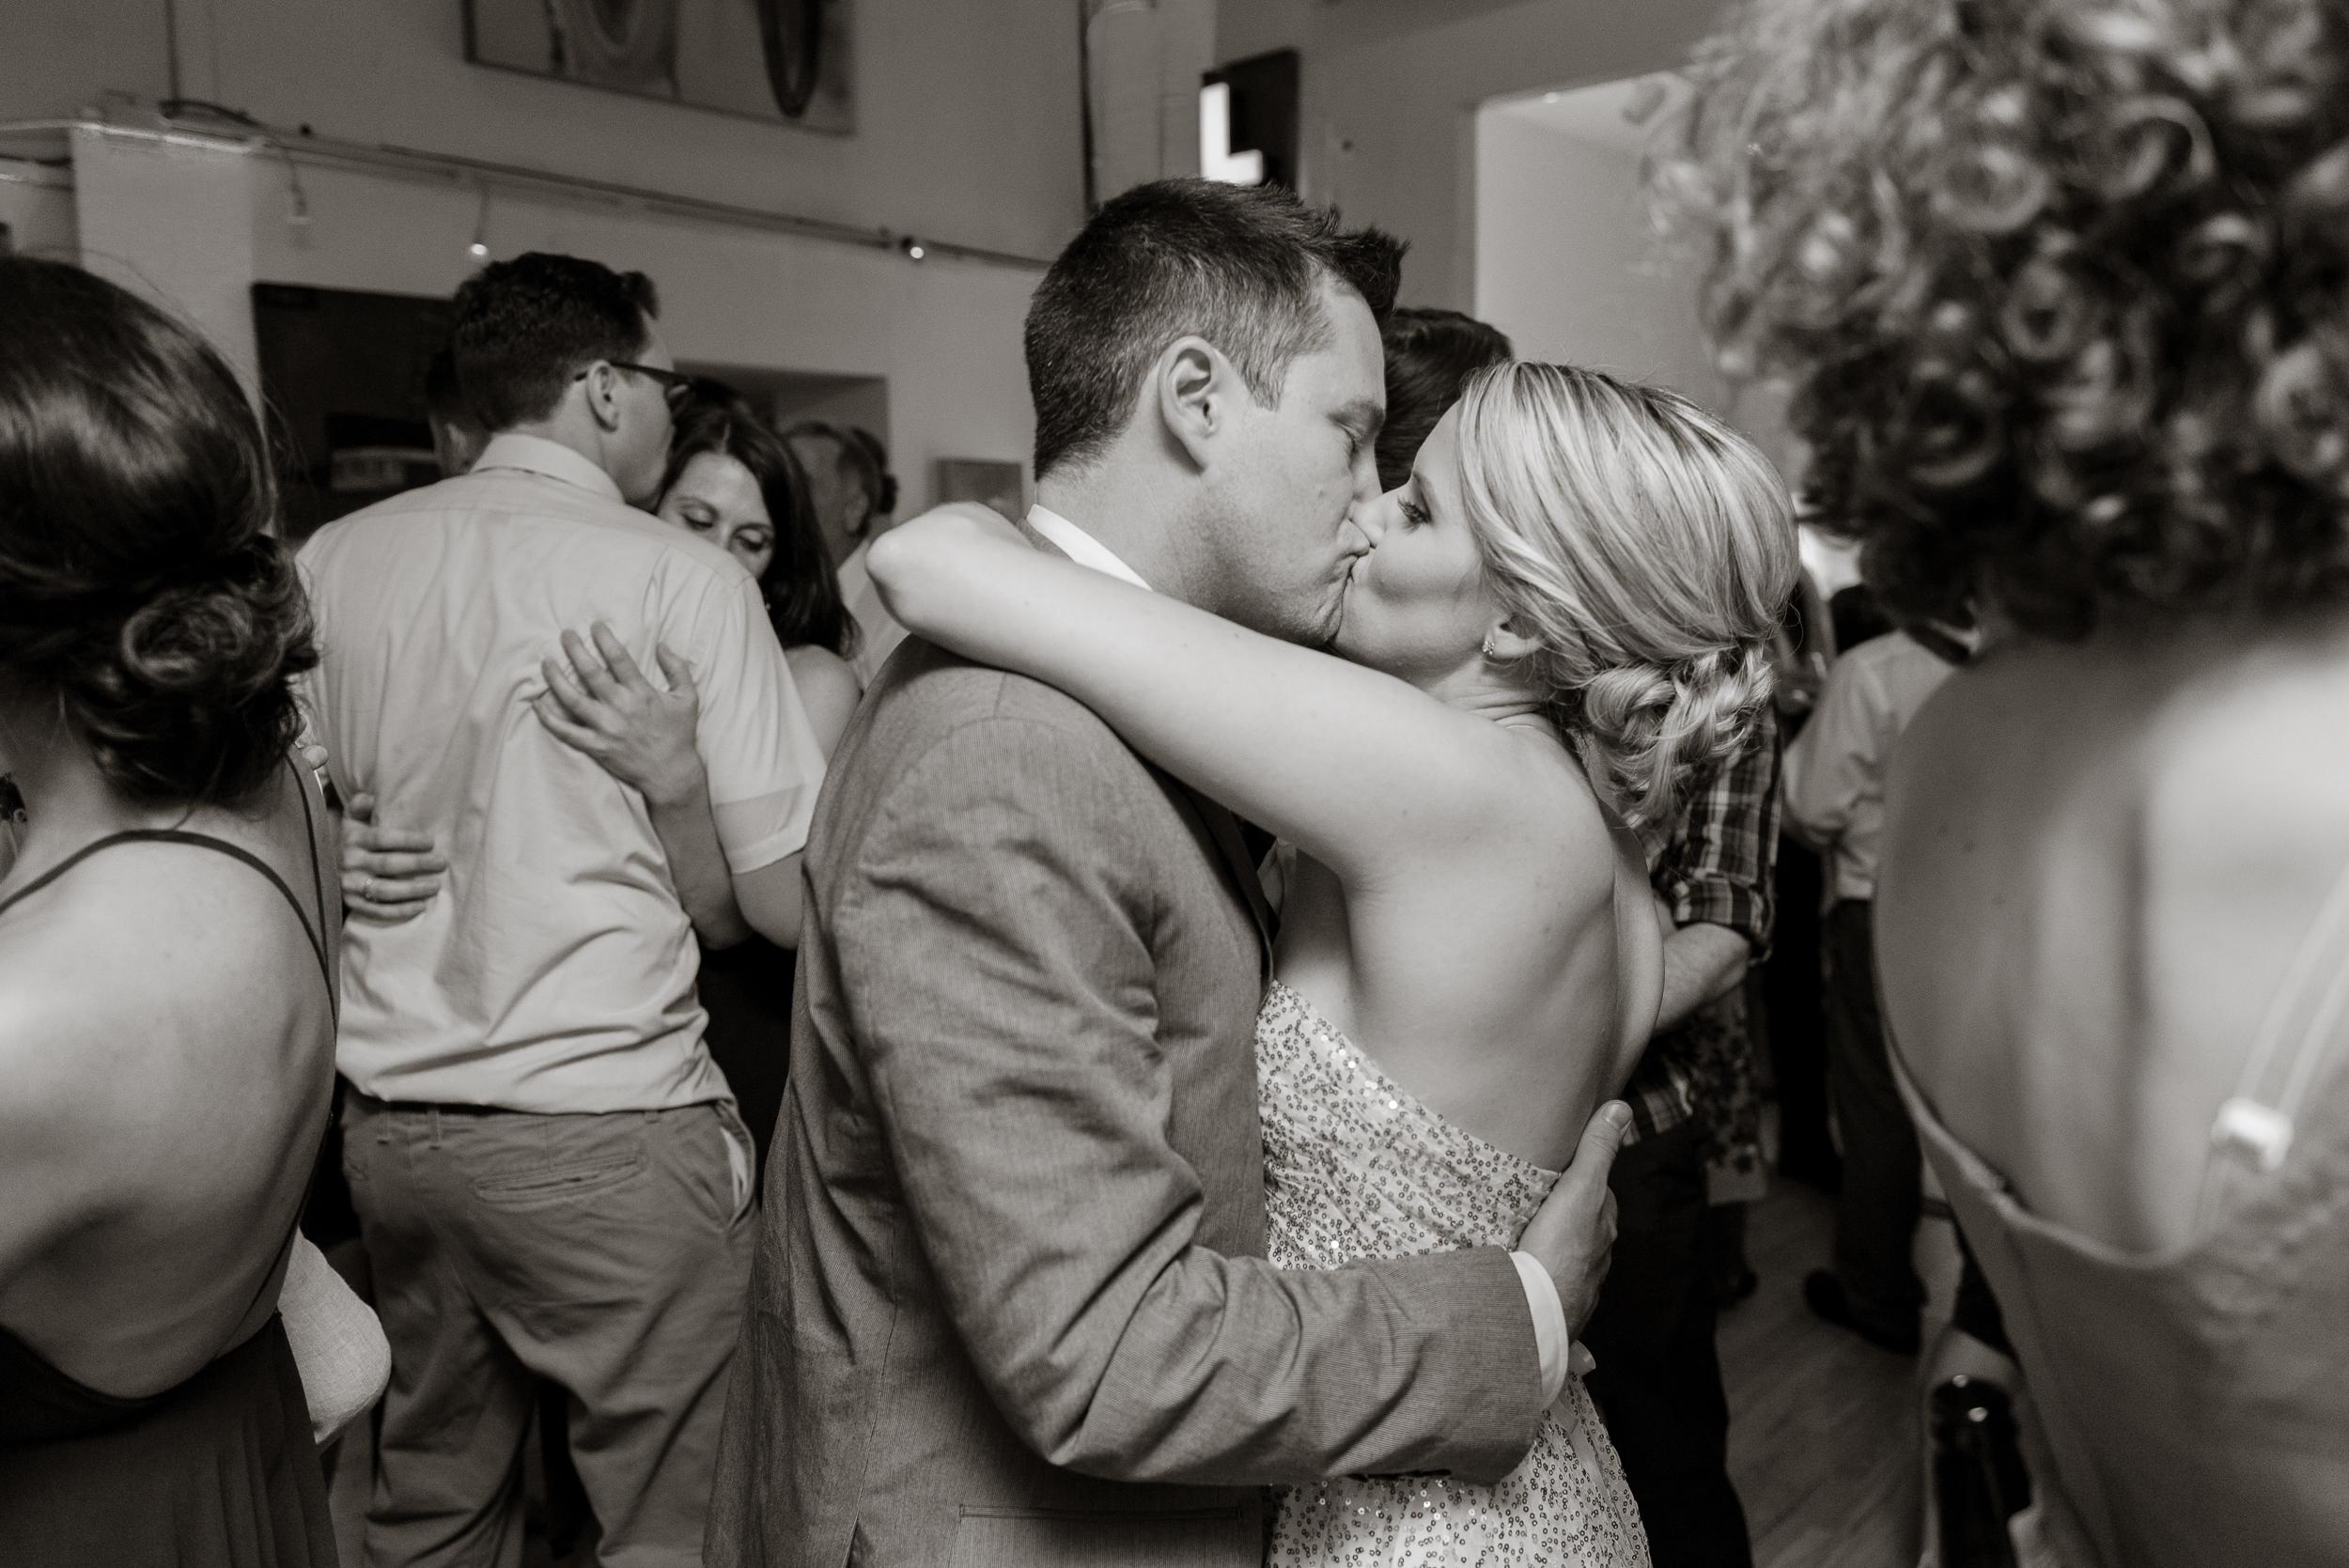 studio-333-sausalito-wedding-photographer-vc57.jpg